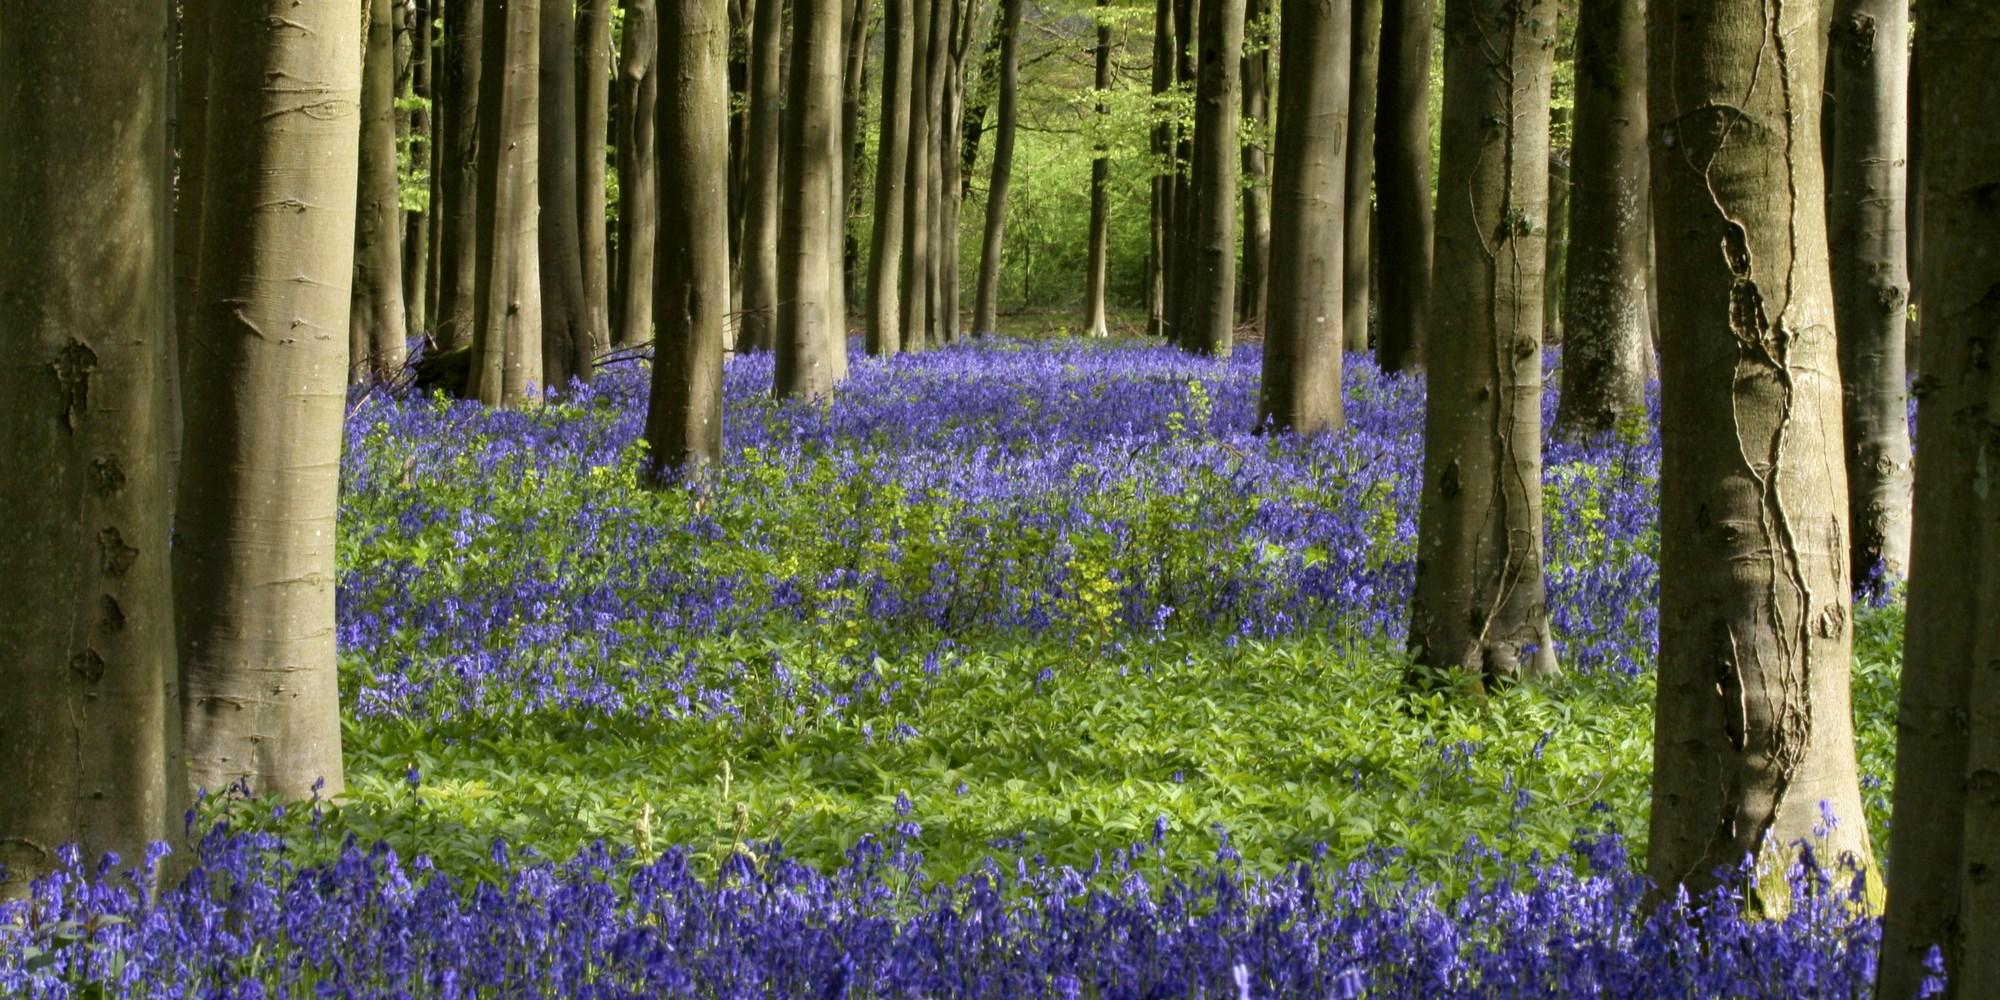 A carpet of bluebells under bare trees in springtime